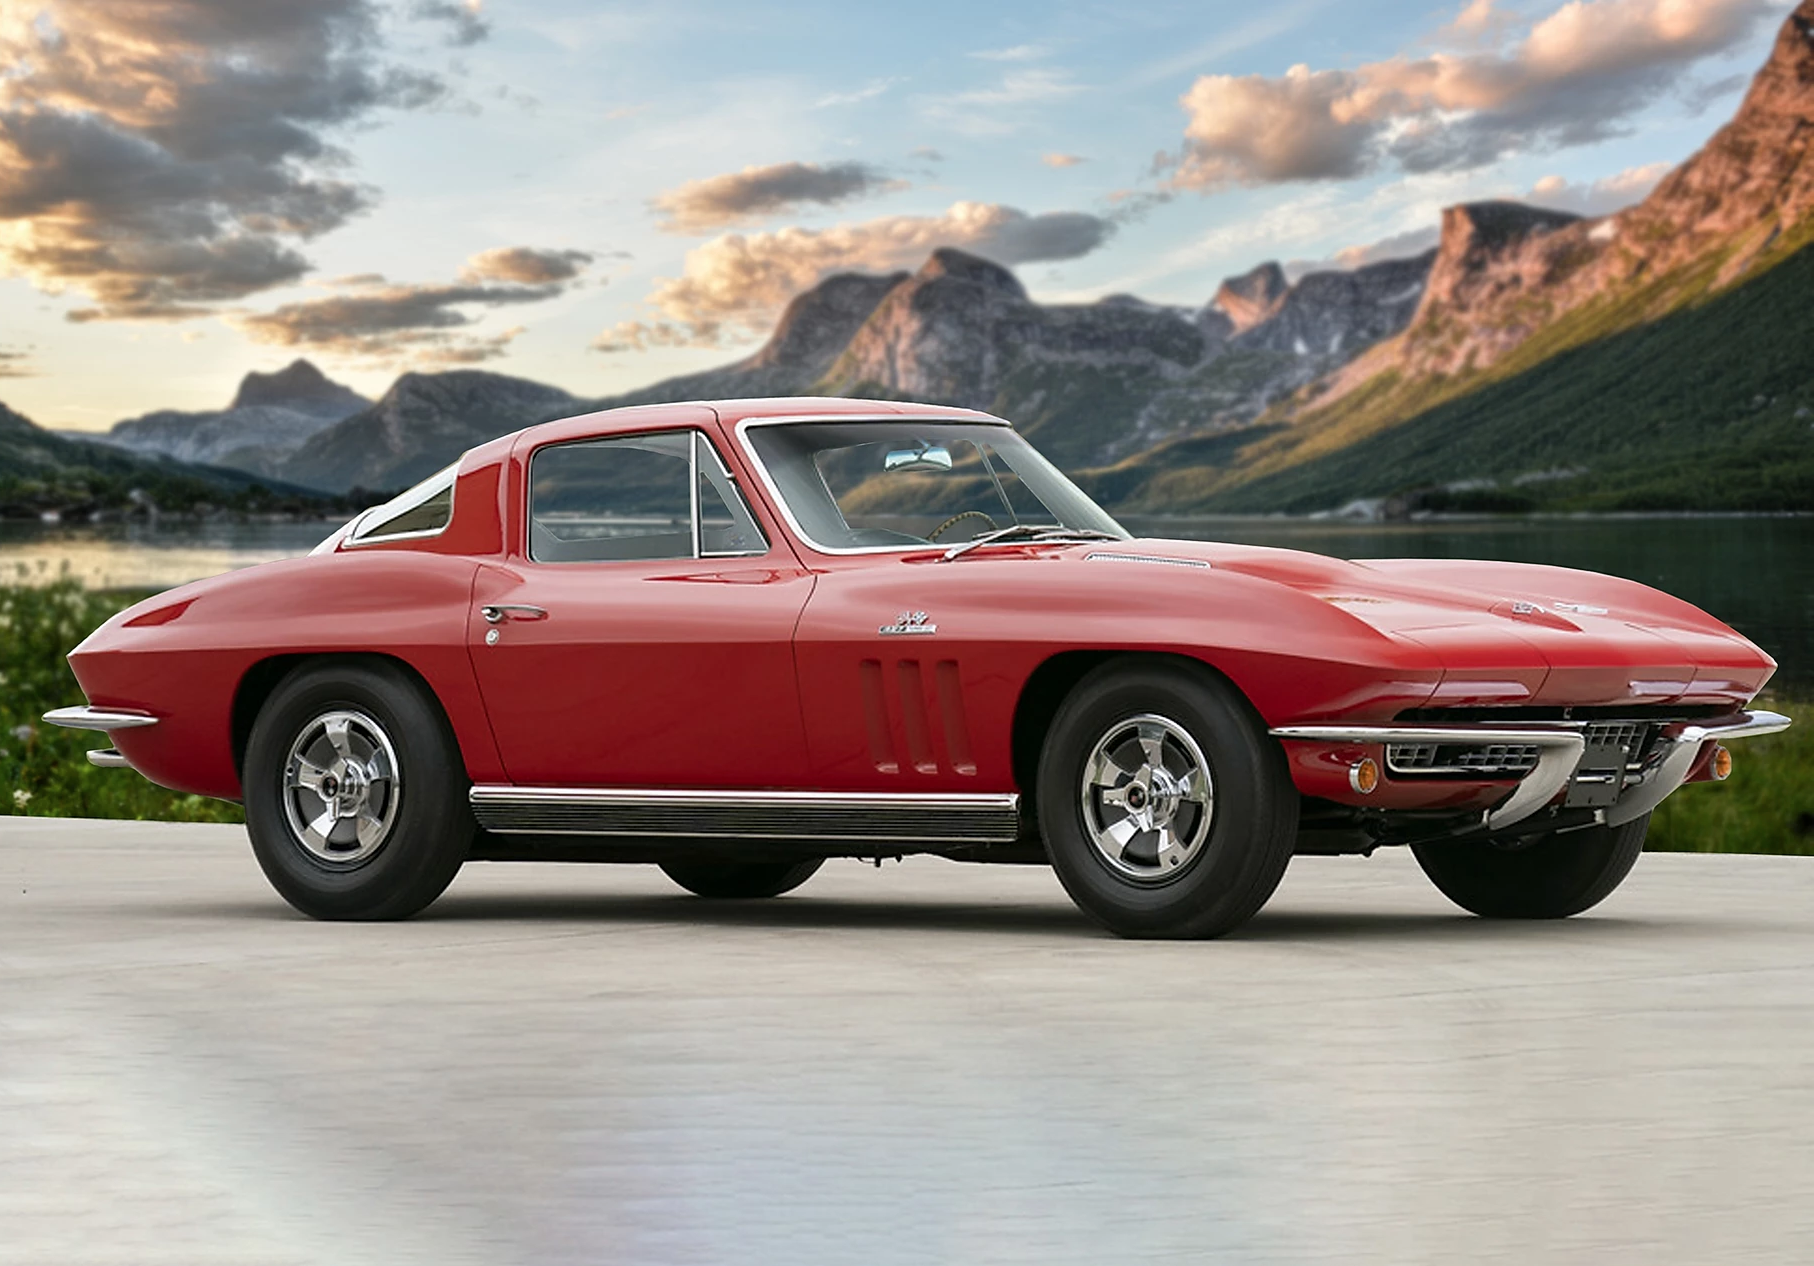 "<img src=""1966-corvette.png"" alt=""A 1966 Chevrolet Corvette Stingray"">"